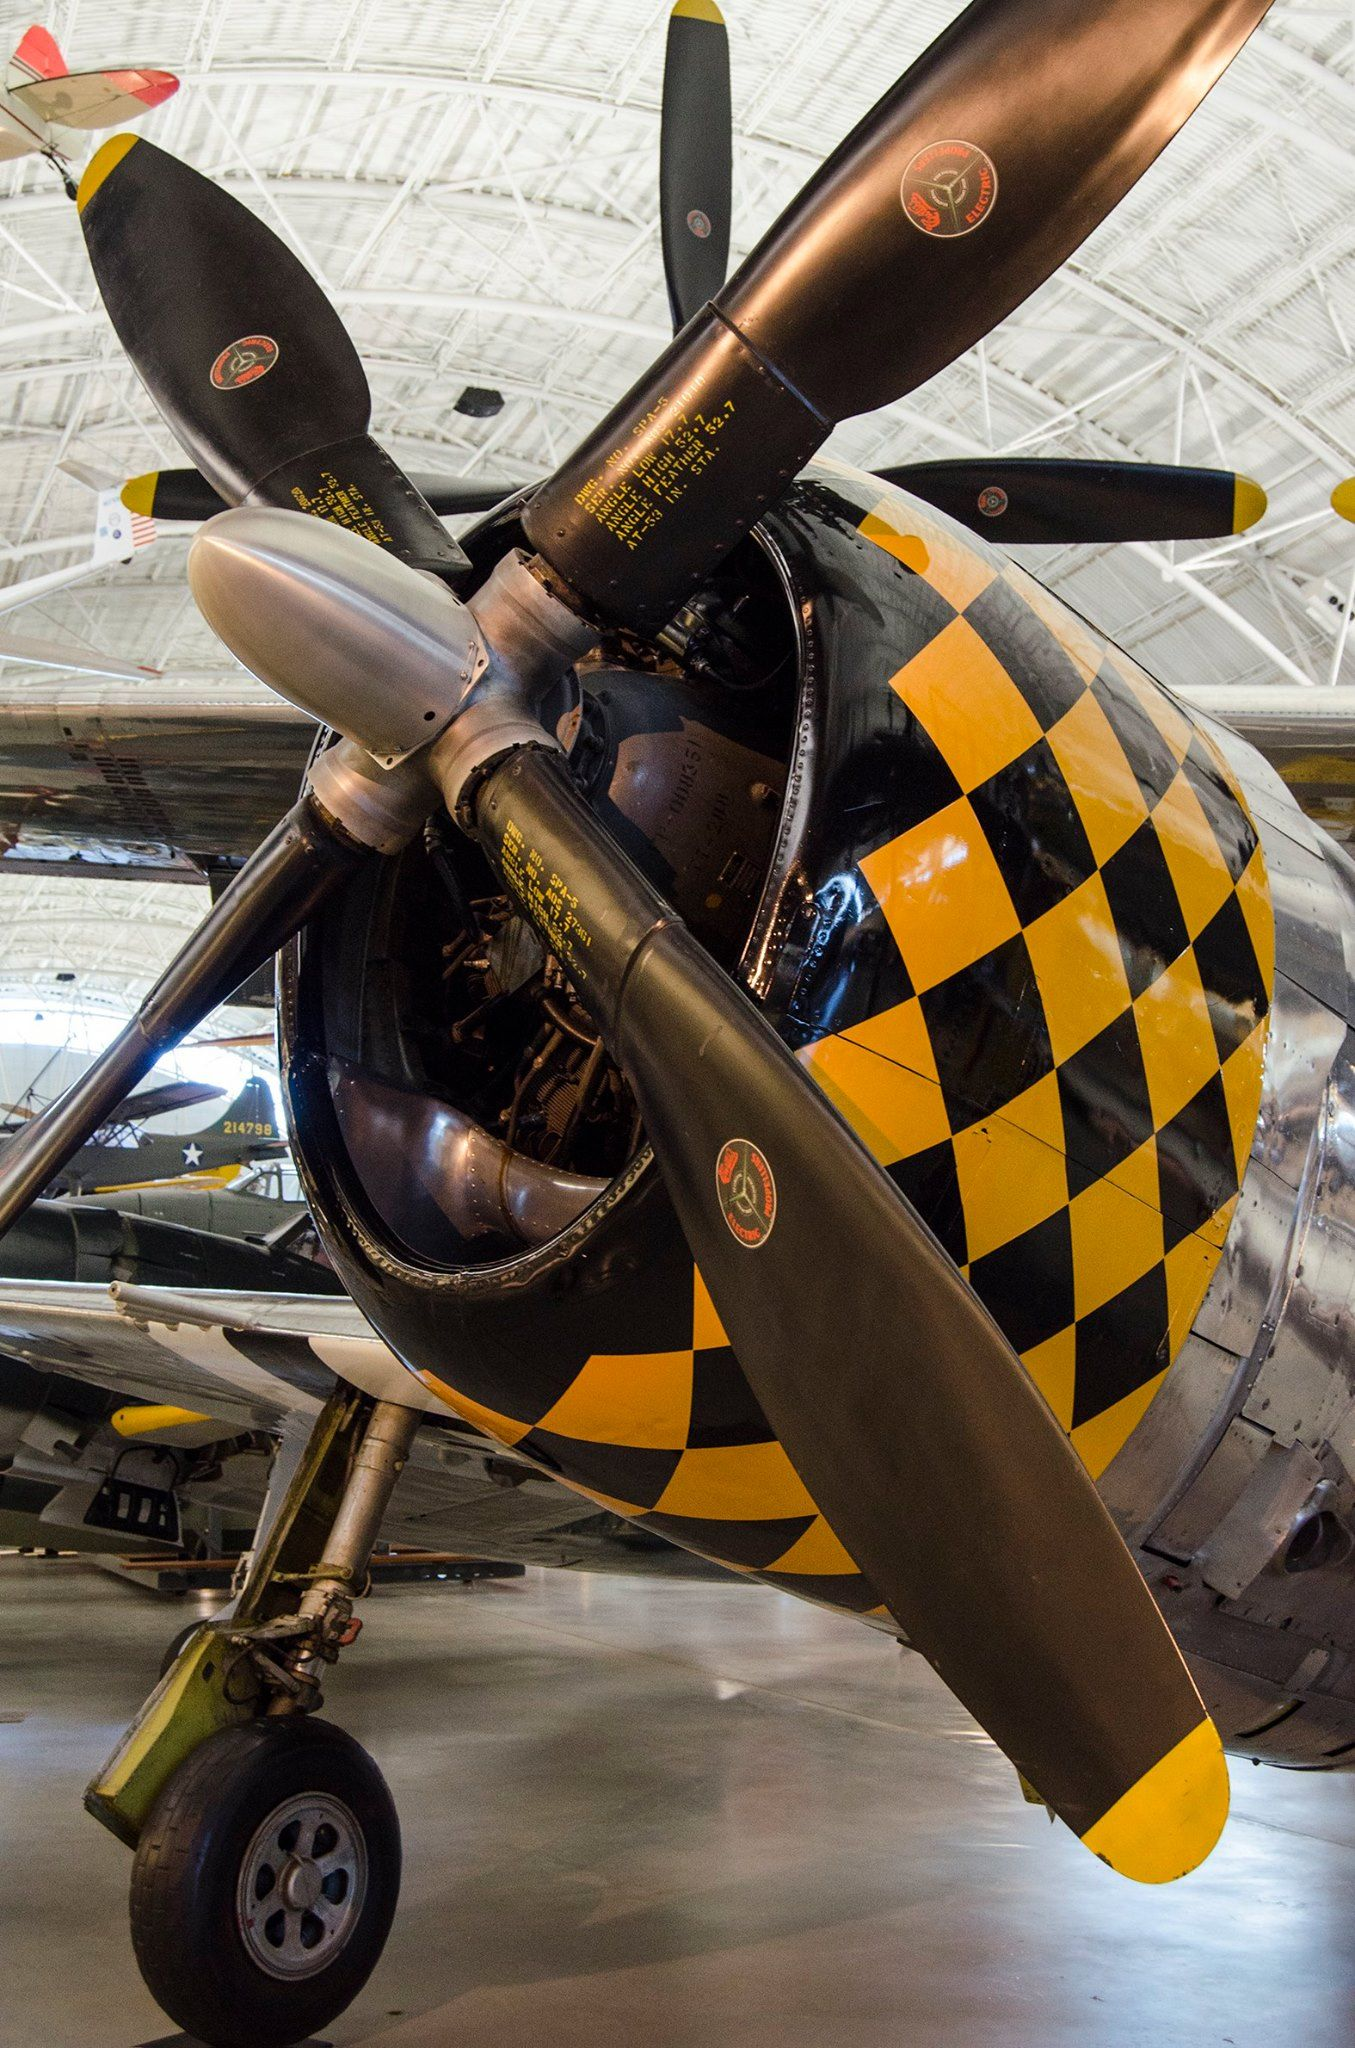 Pin on Republic P-47 Thunderbolt